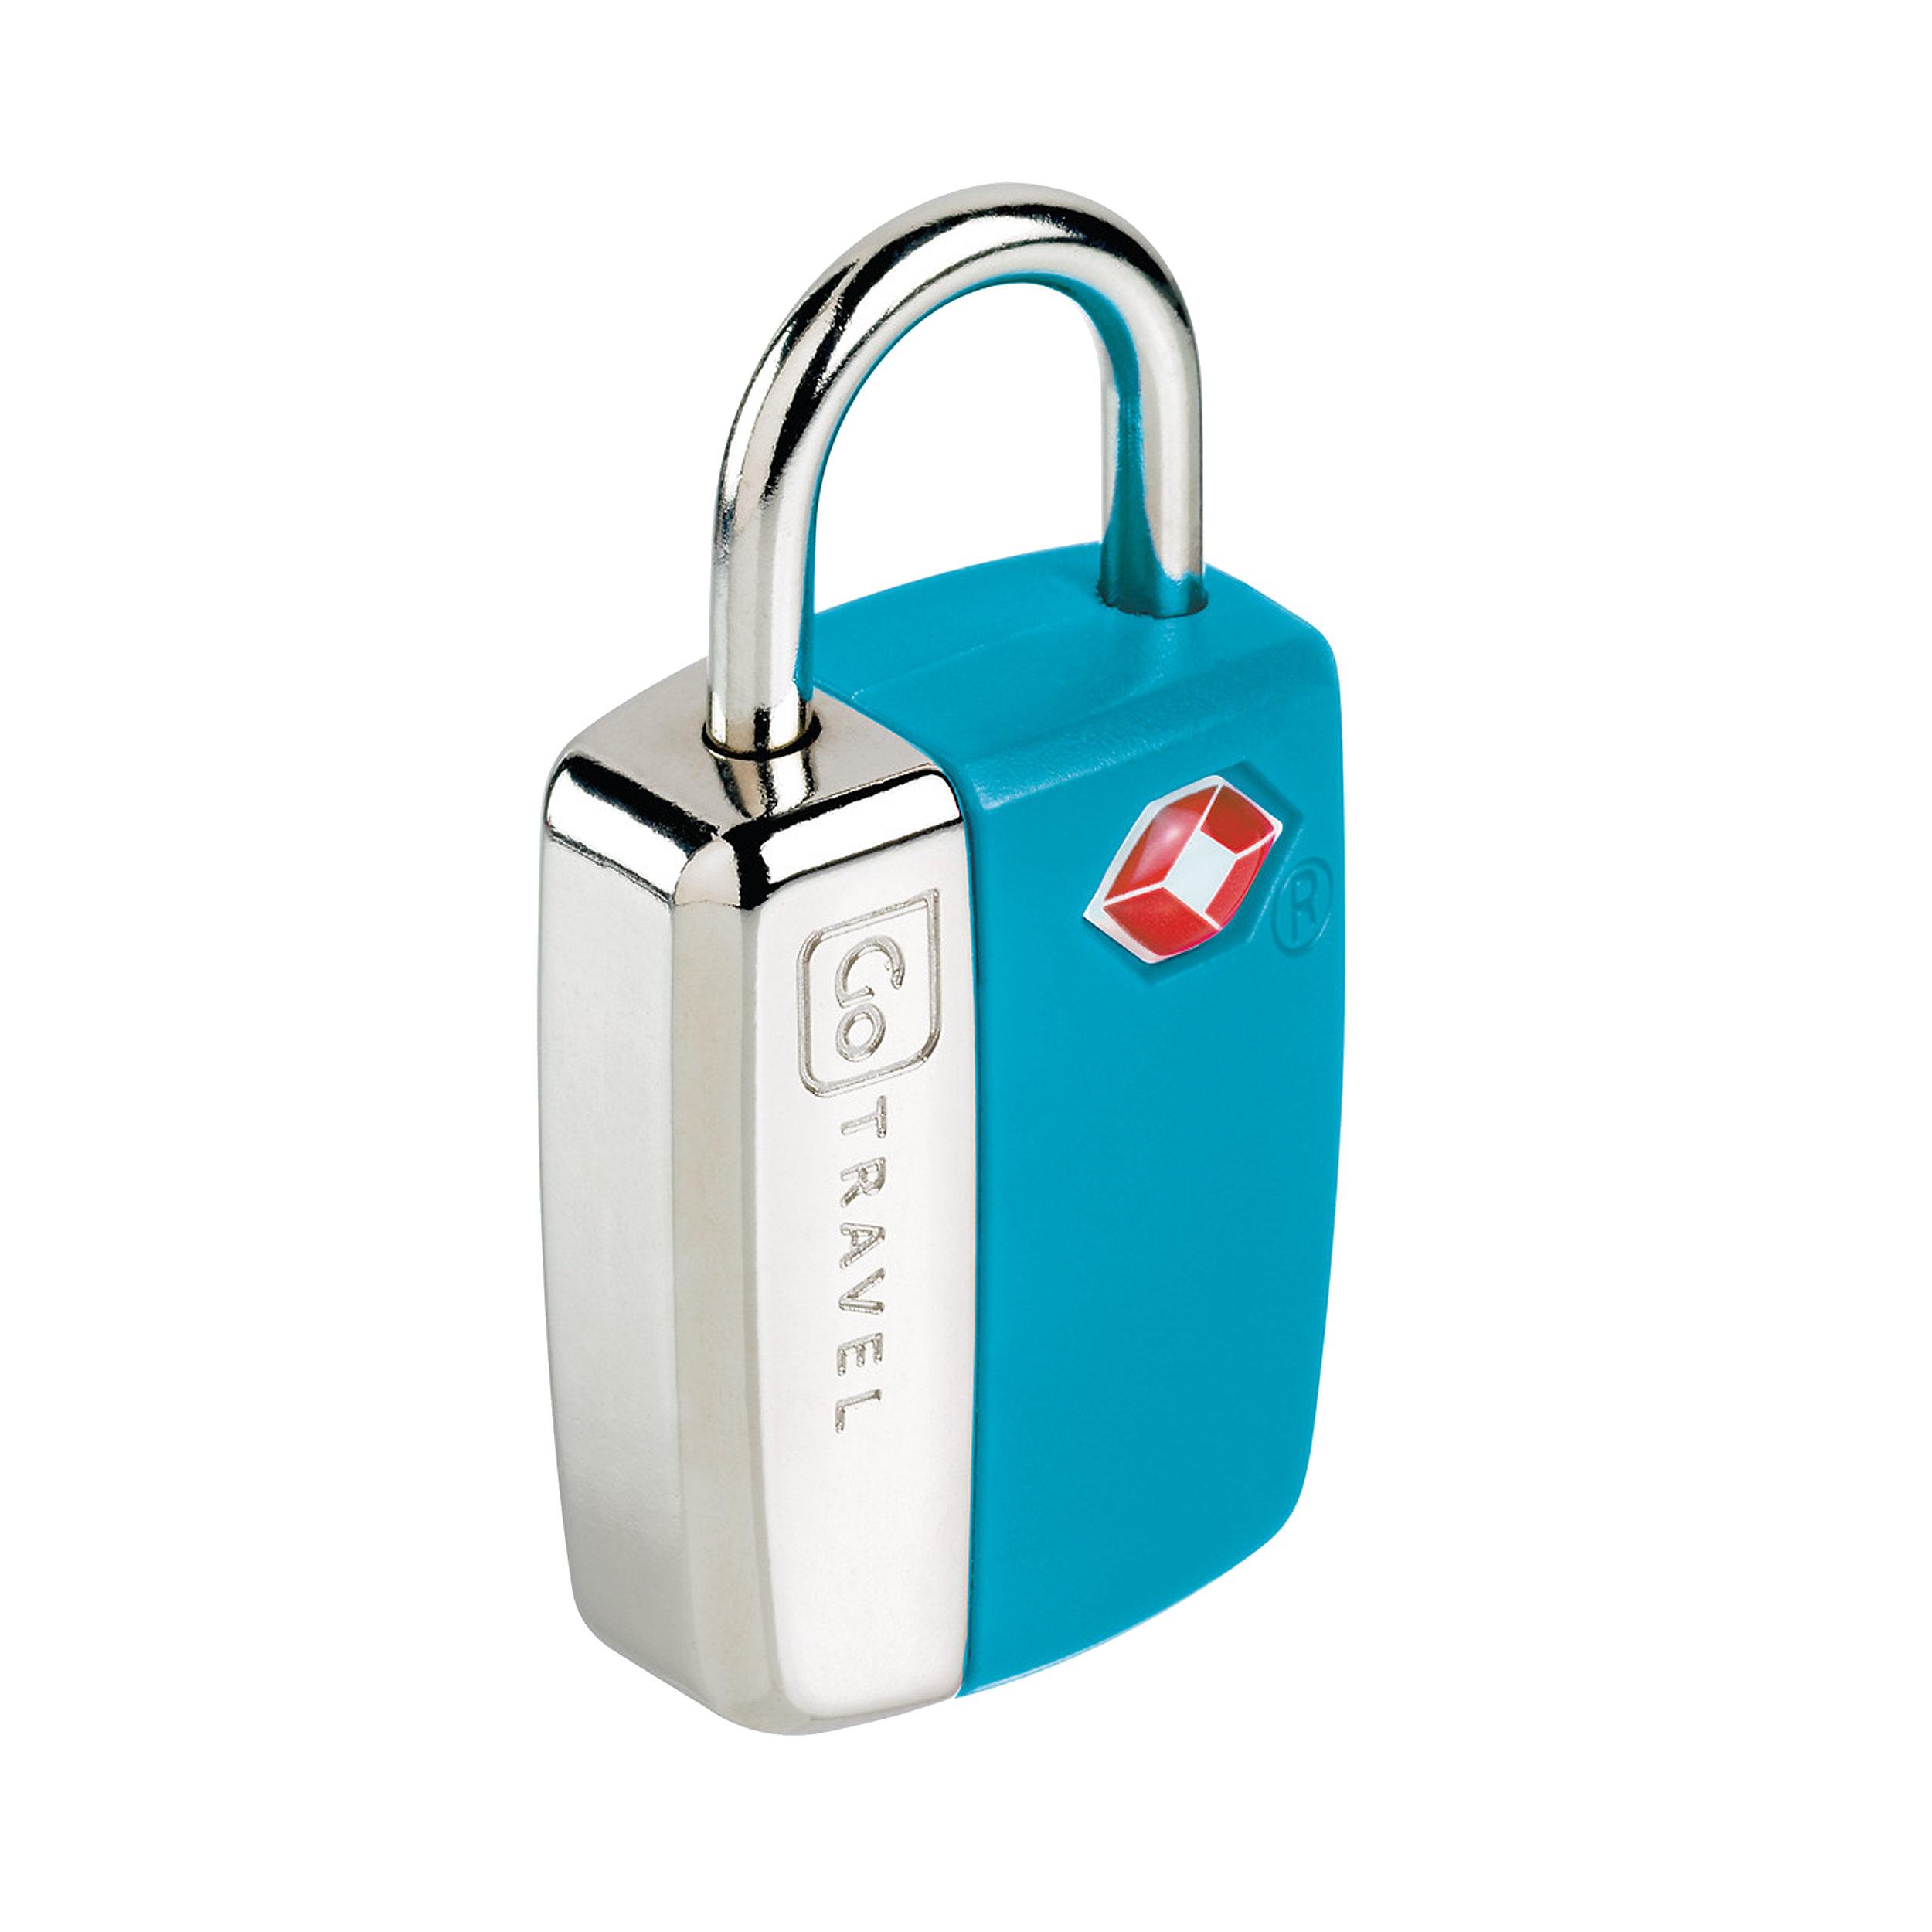 TSA-Sicherheitsschloss Glo Travel Sentry®